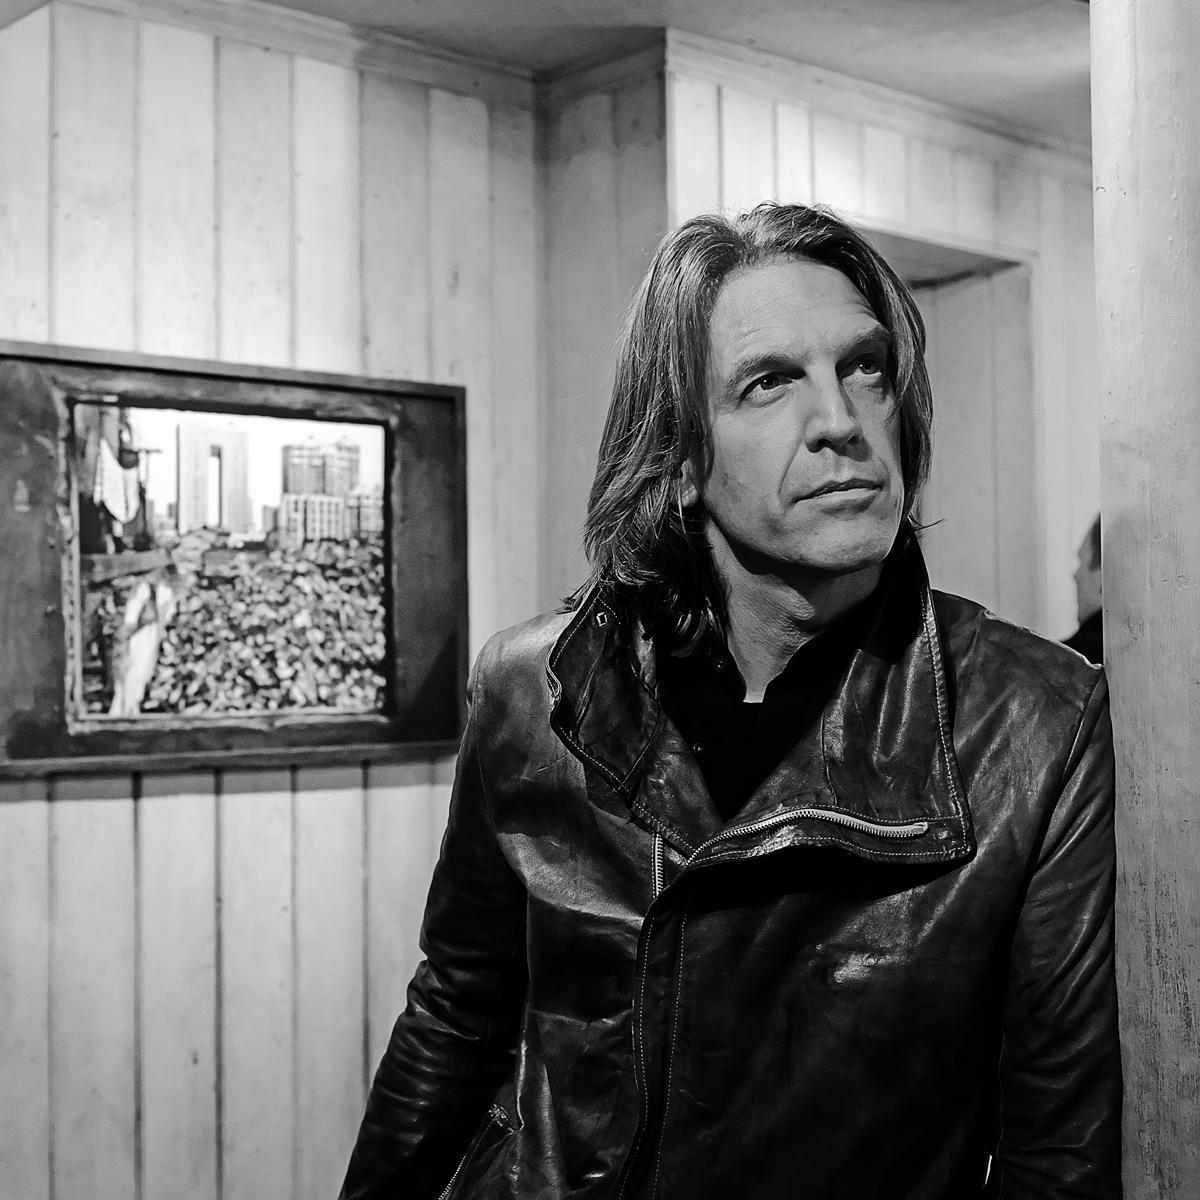 Professional Photograph of Graham Fink, Artist & Creative by Julian Hanford, London